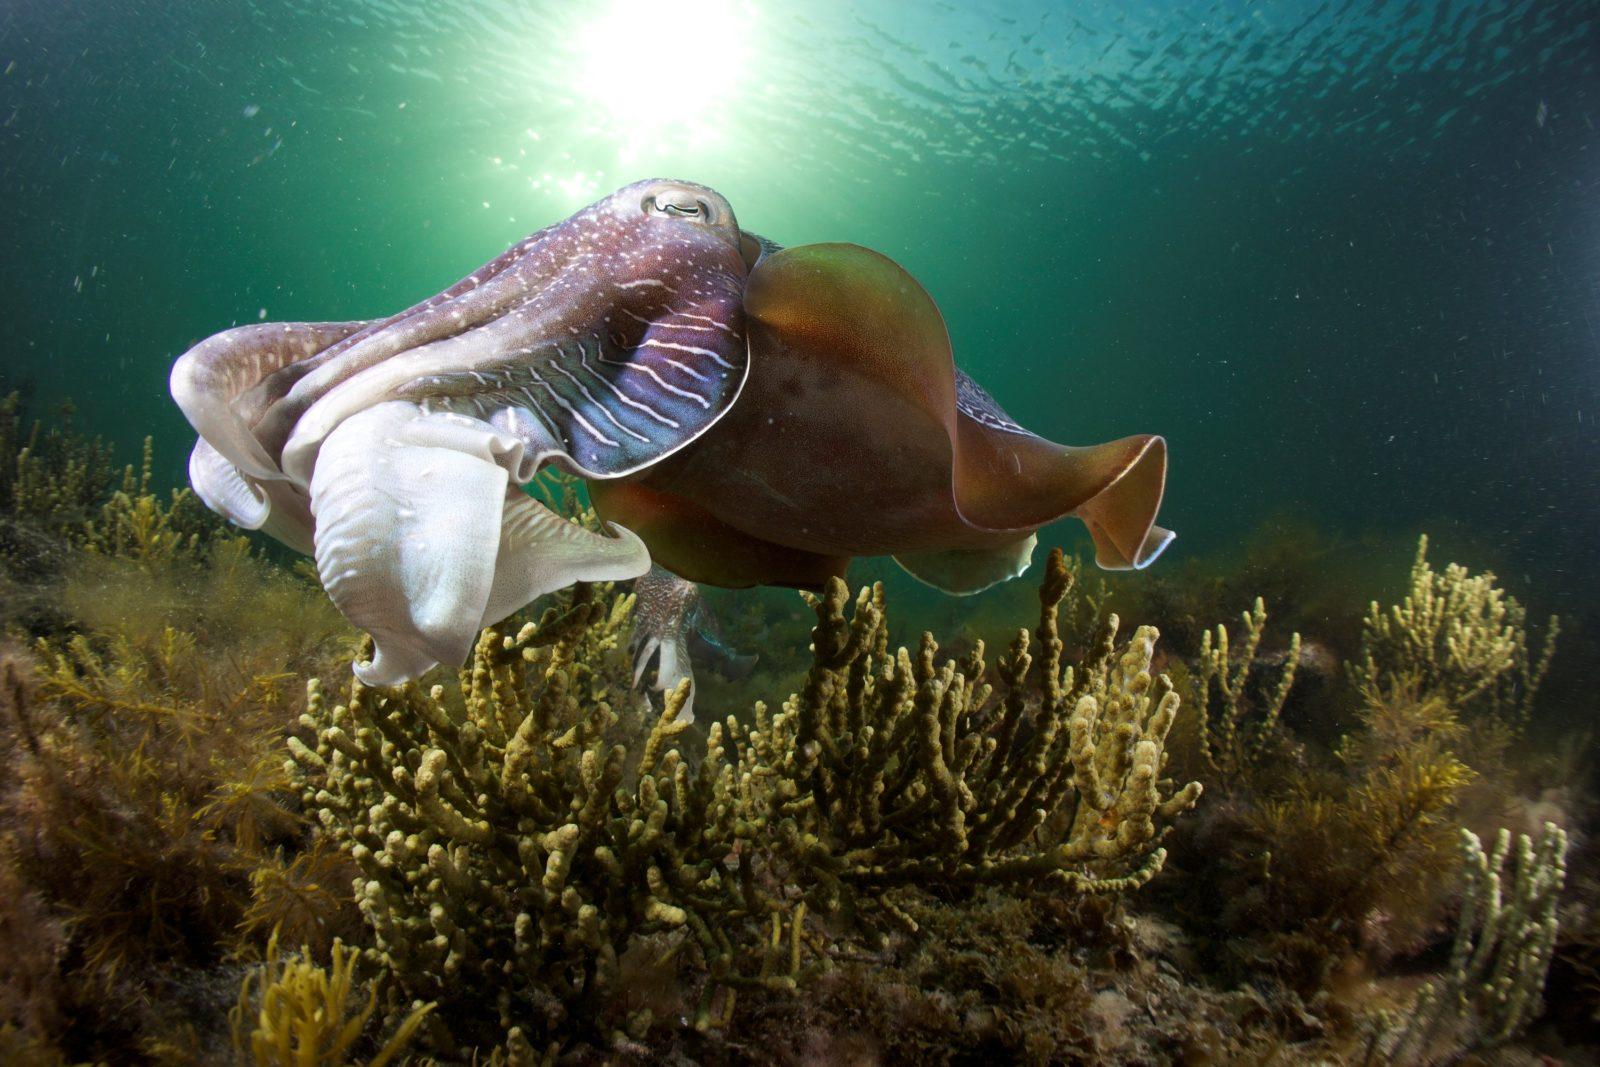 Whyalla Austrailan Giant Cuttlefish